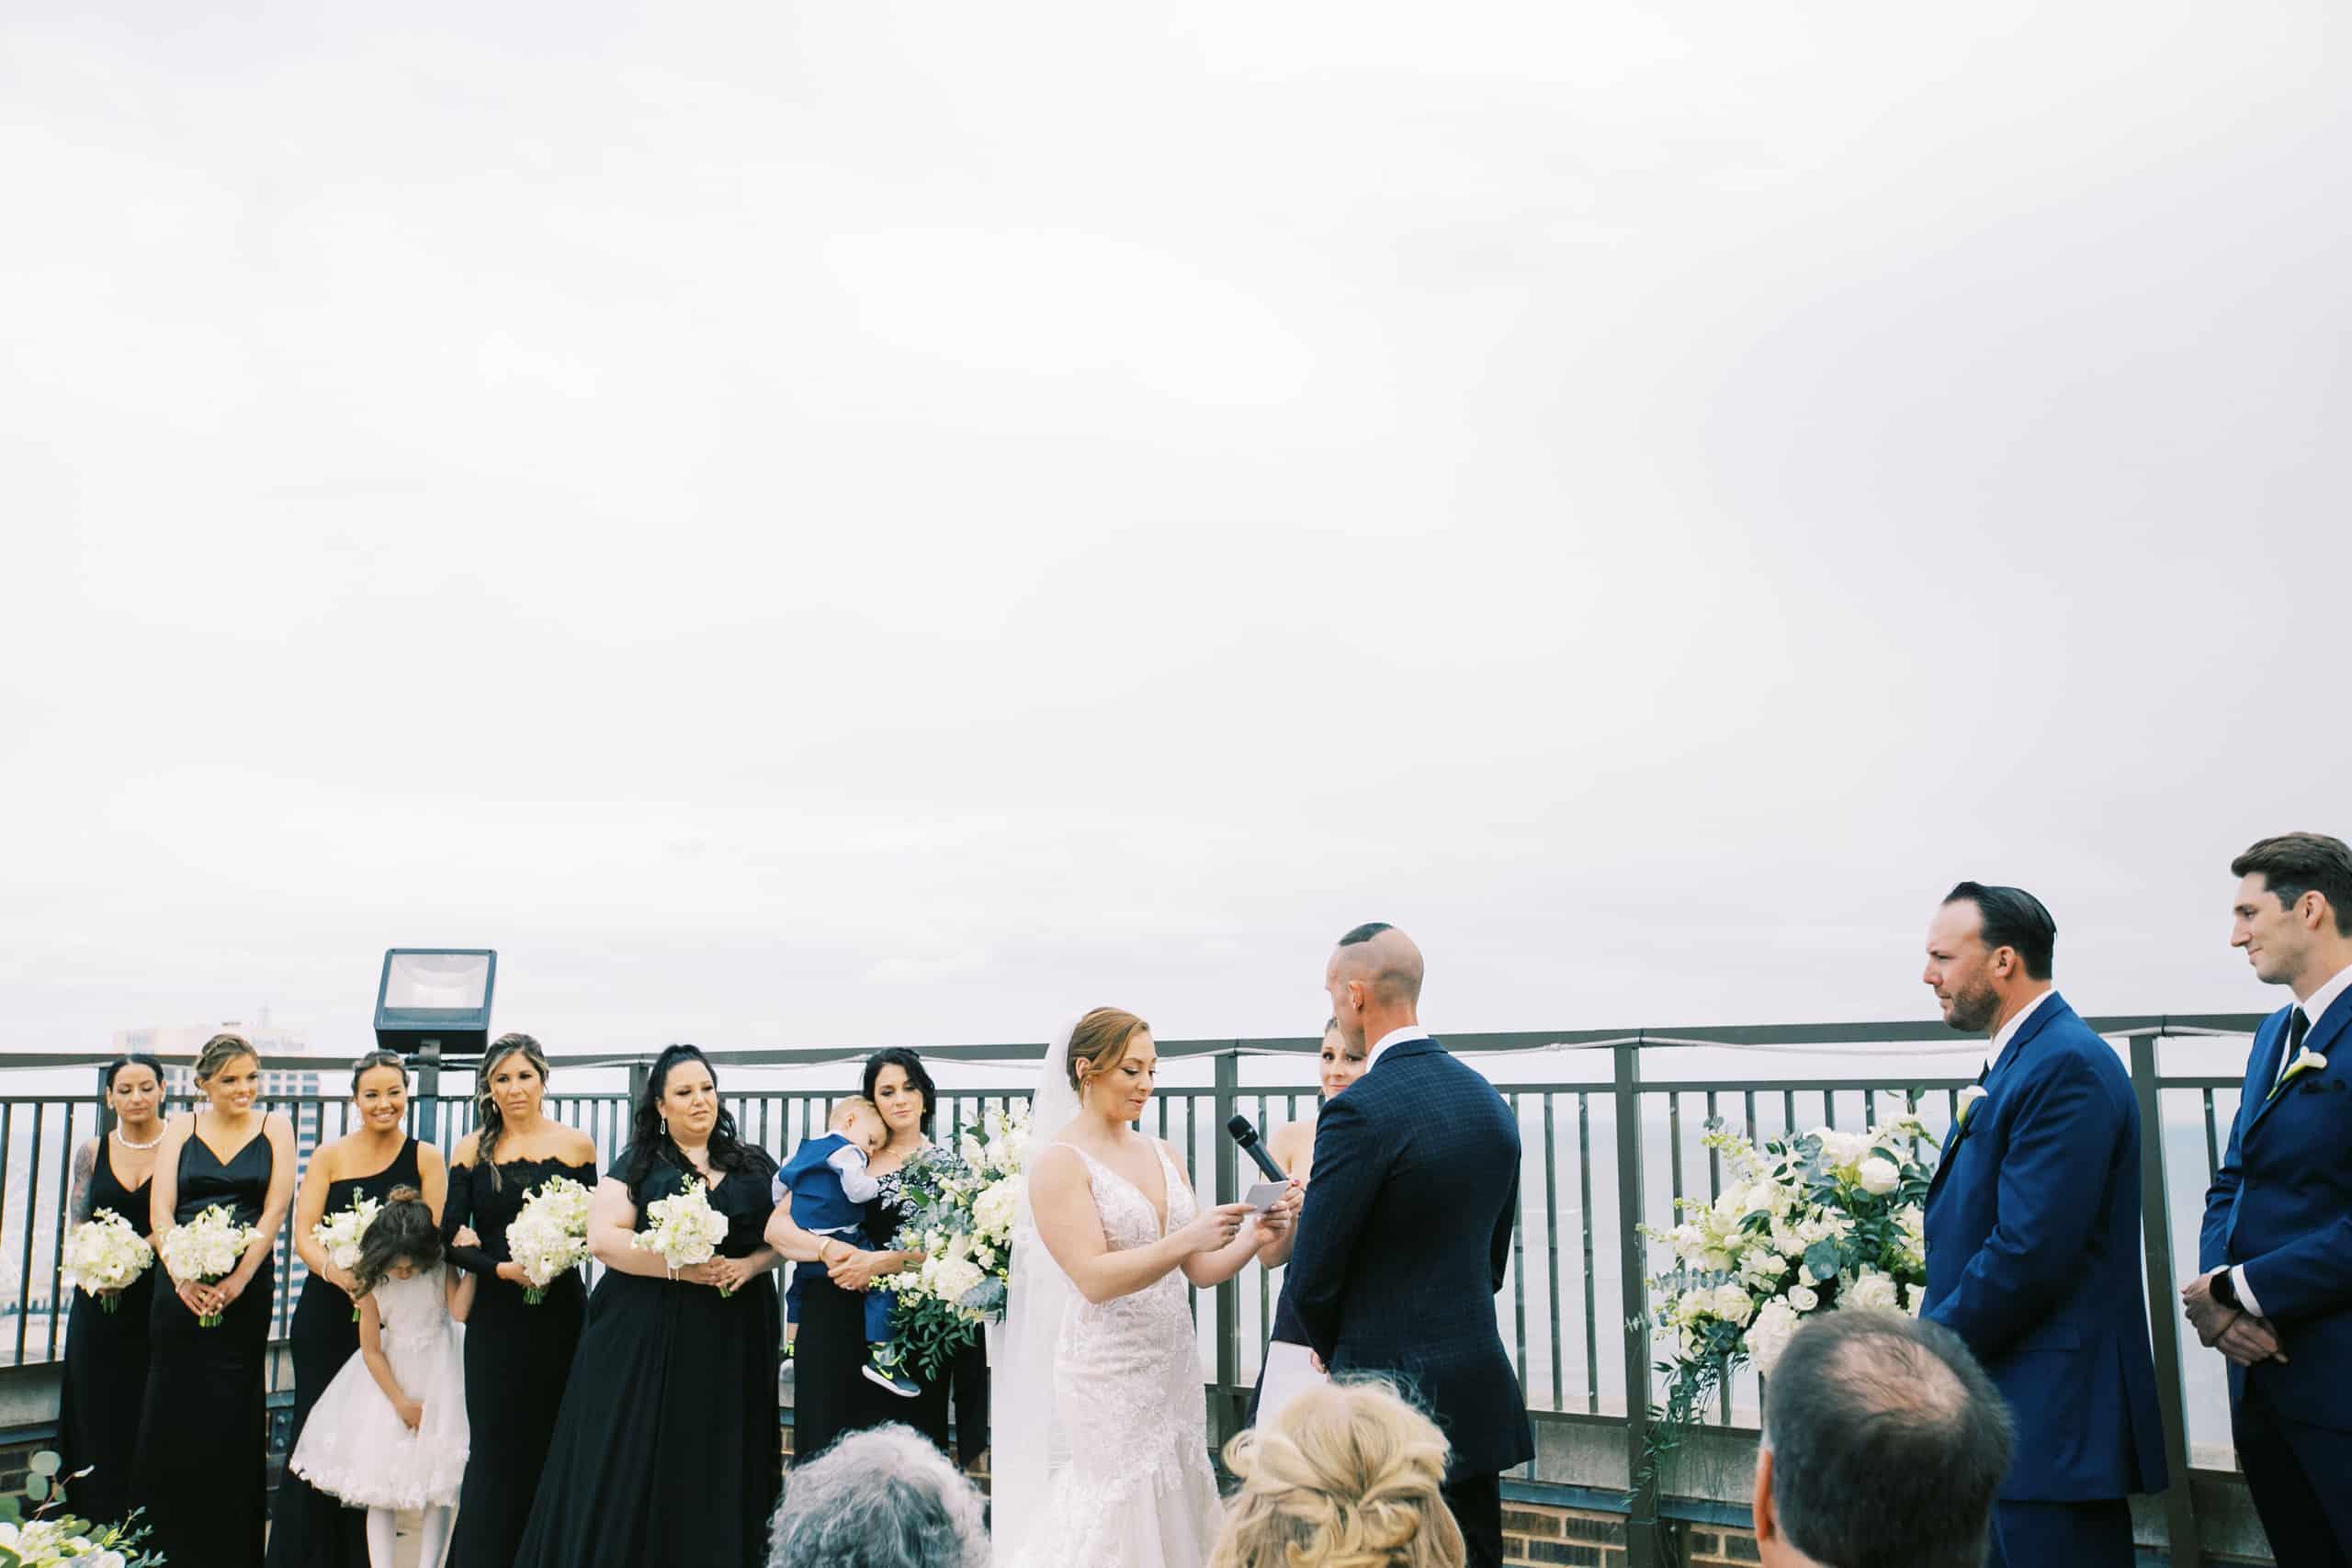 Rooftop wedding photos at Claridge Hotel in Atlantic City